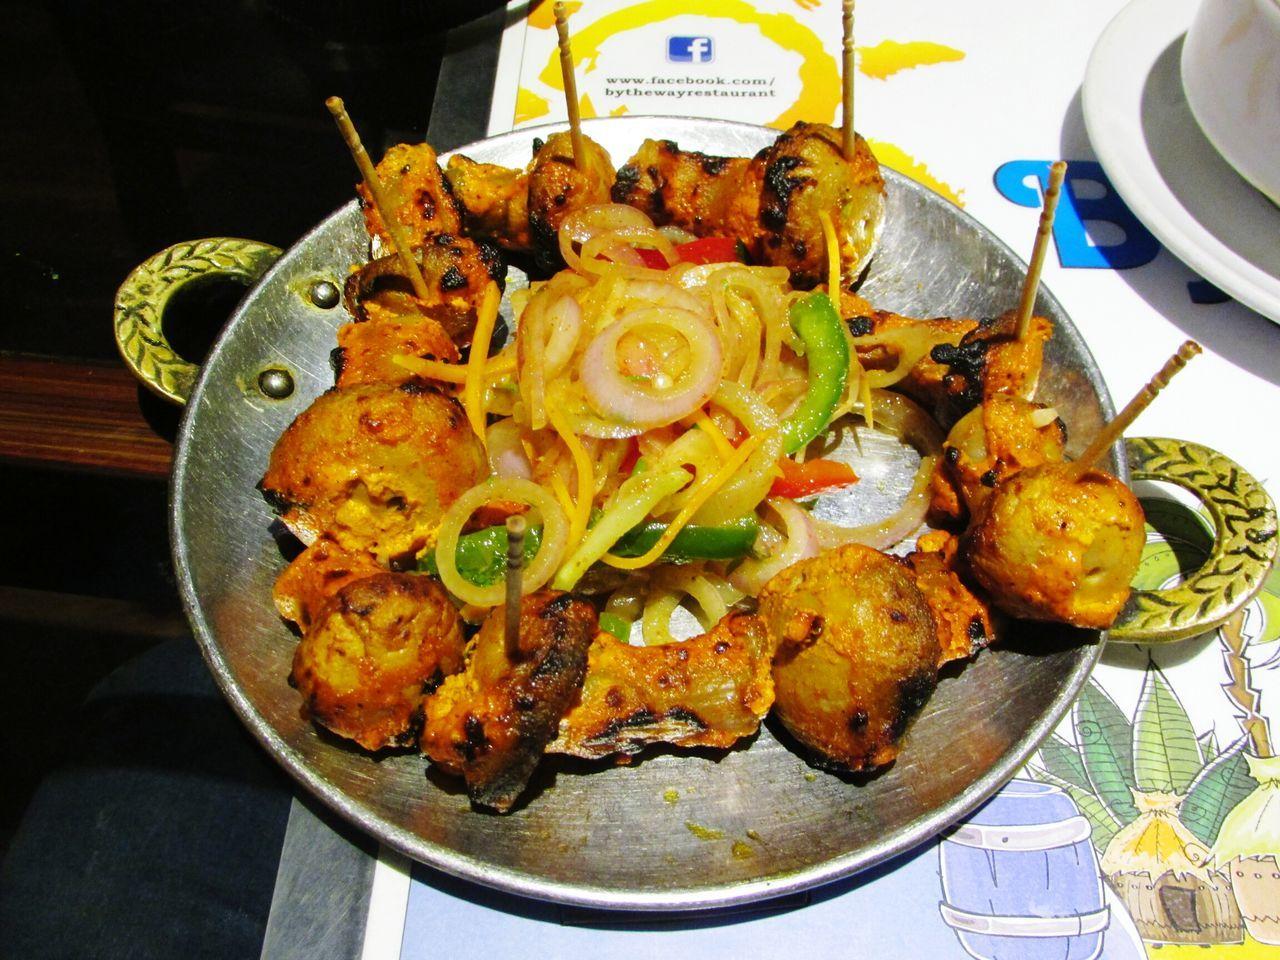 Food Porn Awards Mushrooms Magic. Mushrooms Indian Style Tasty😋 Spicy Food Having Dinner HUNGRYYYYY!!!!